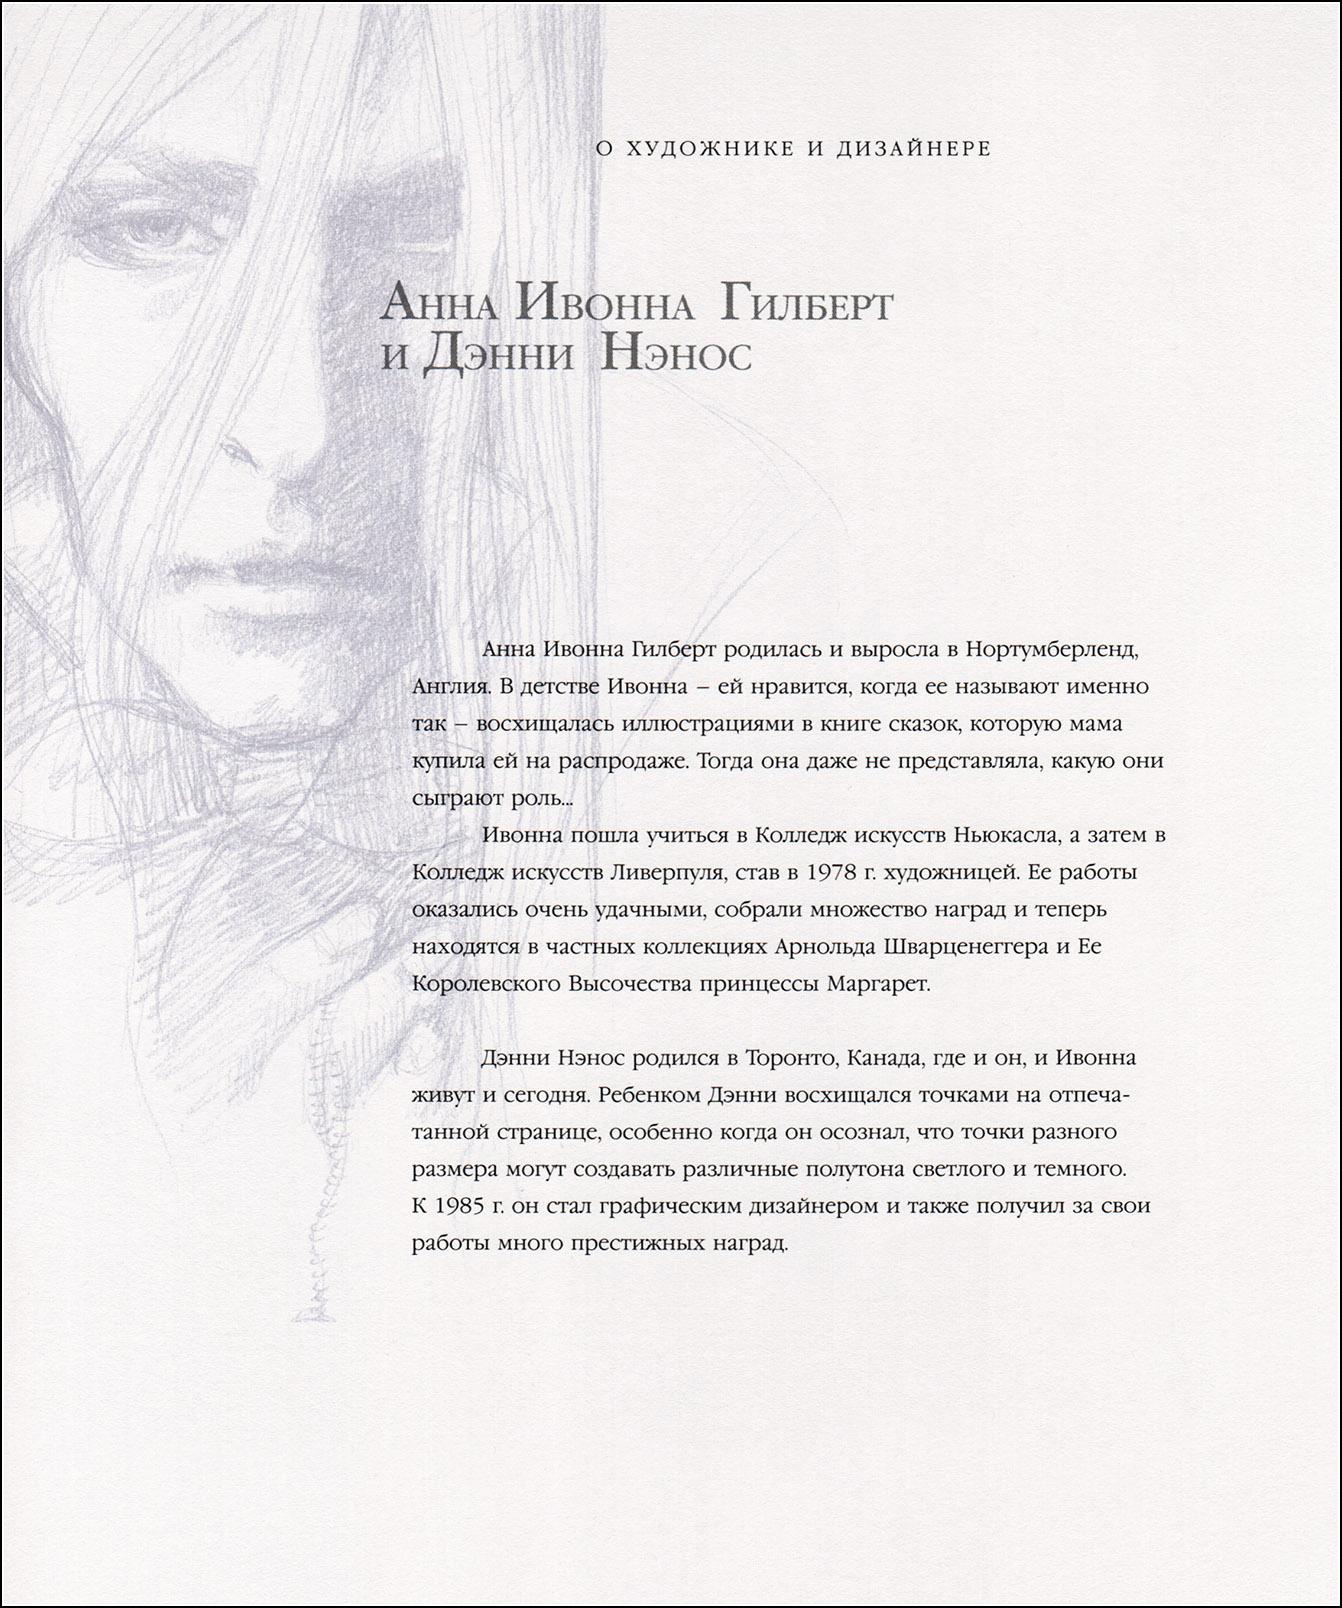 Anne Yvonne Gilbert, Dracula